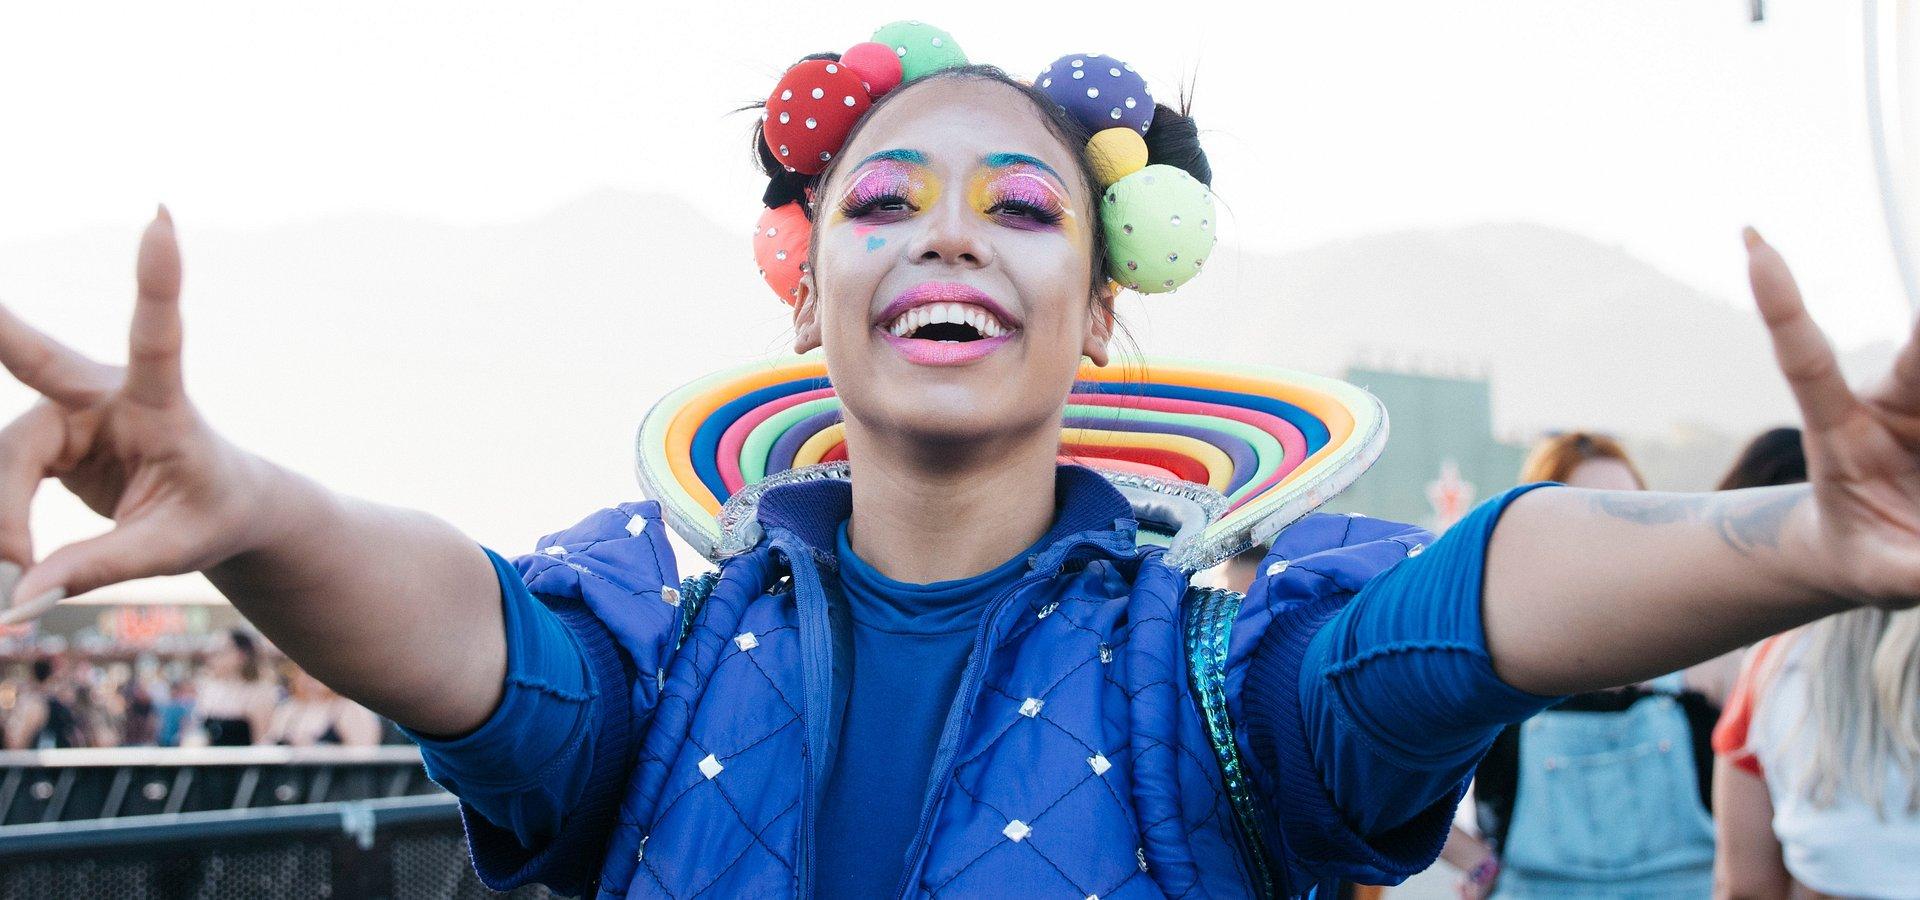 Rock in Rio Lisboa e Carnaval de Torres Vedras desafiam foliões